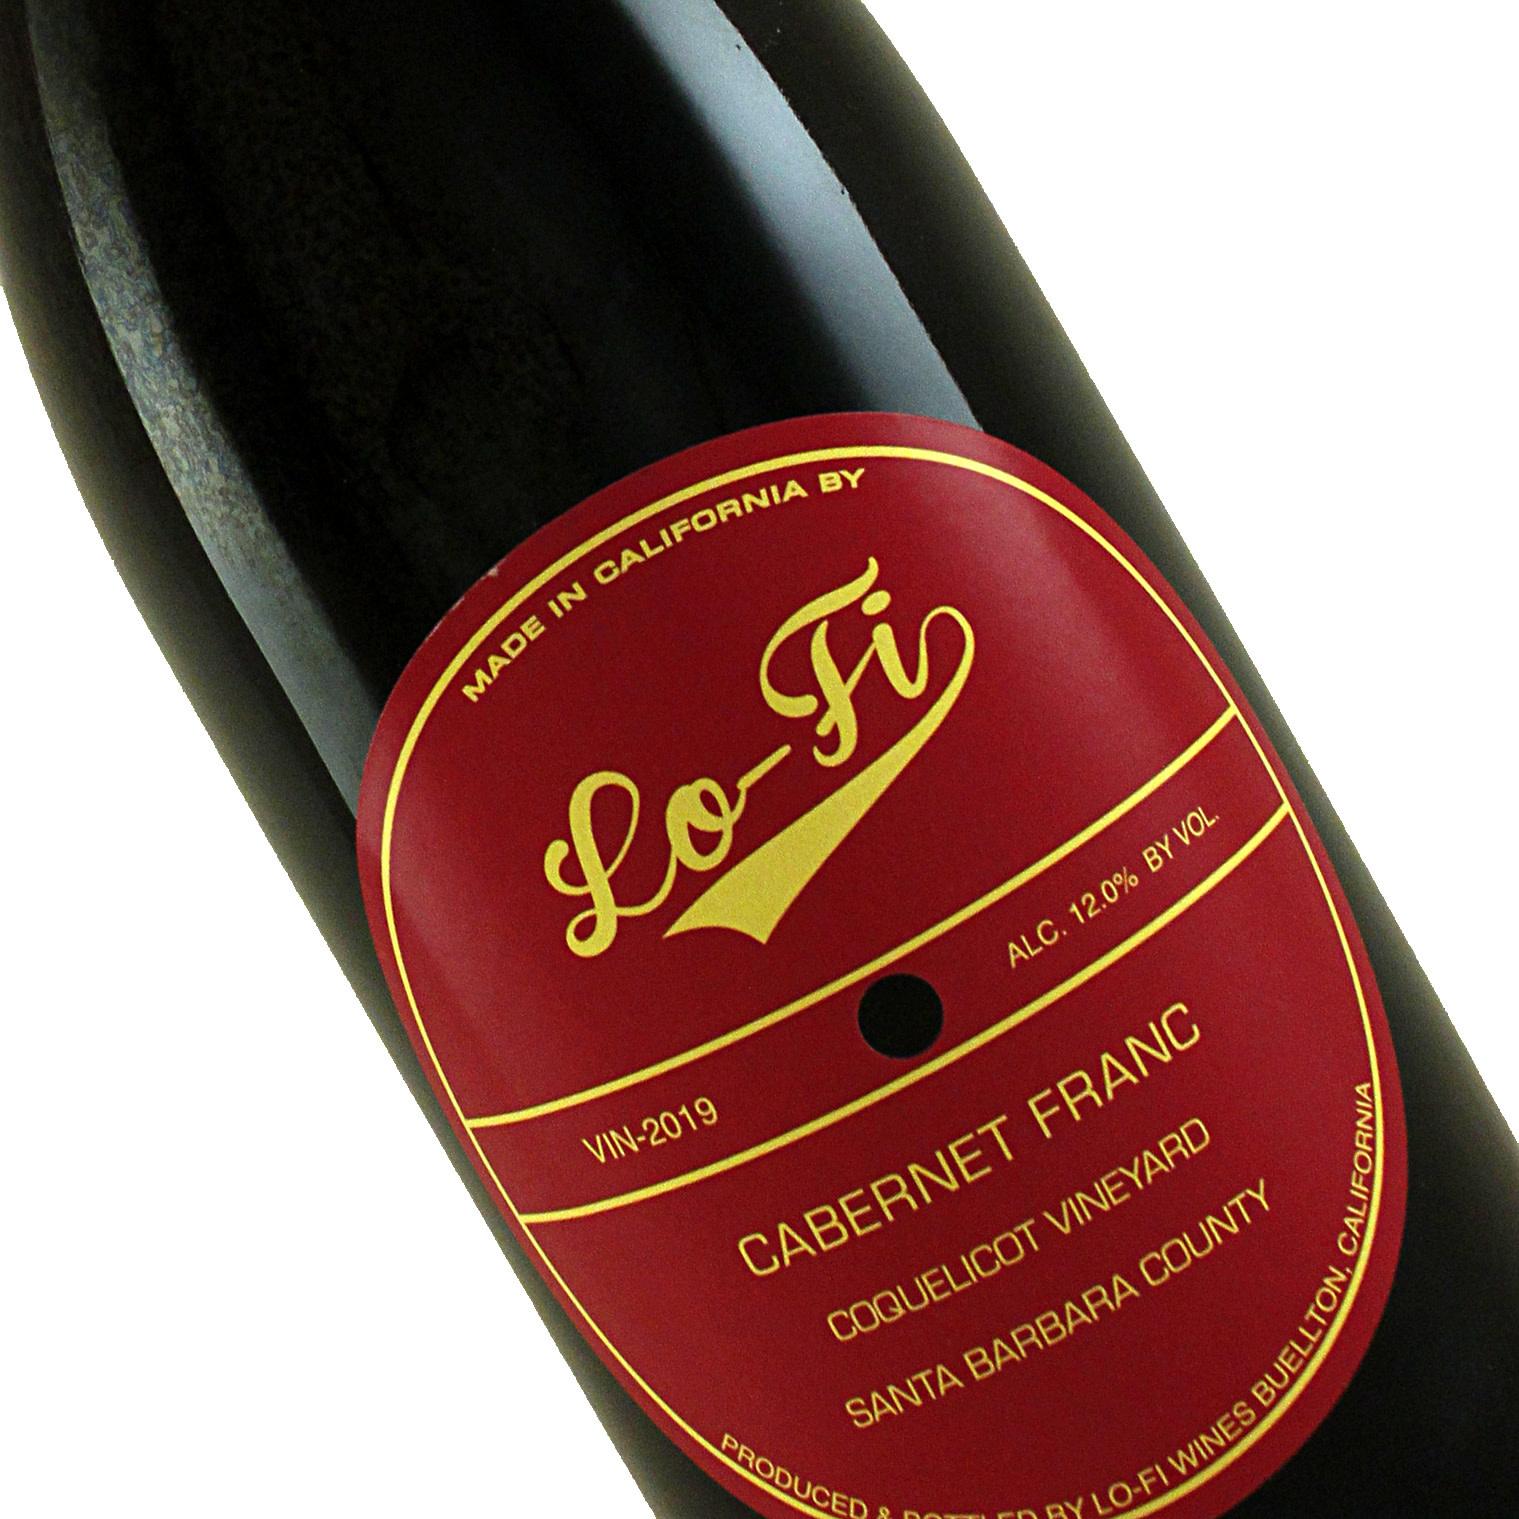 Lo-Fi Wines 2019 Cabernet Franc Coquelicot Vineyard, Santa Barbara County